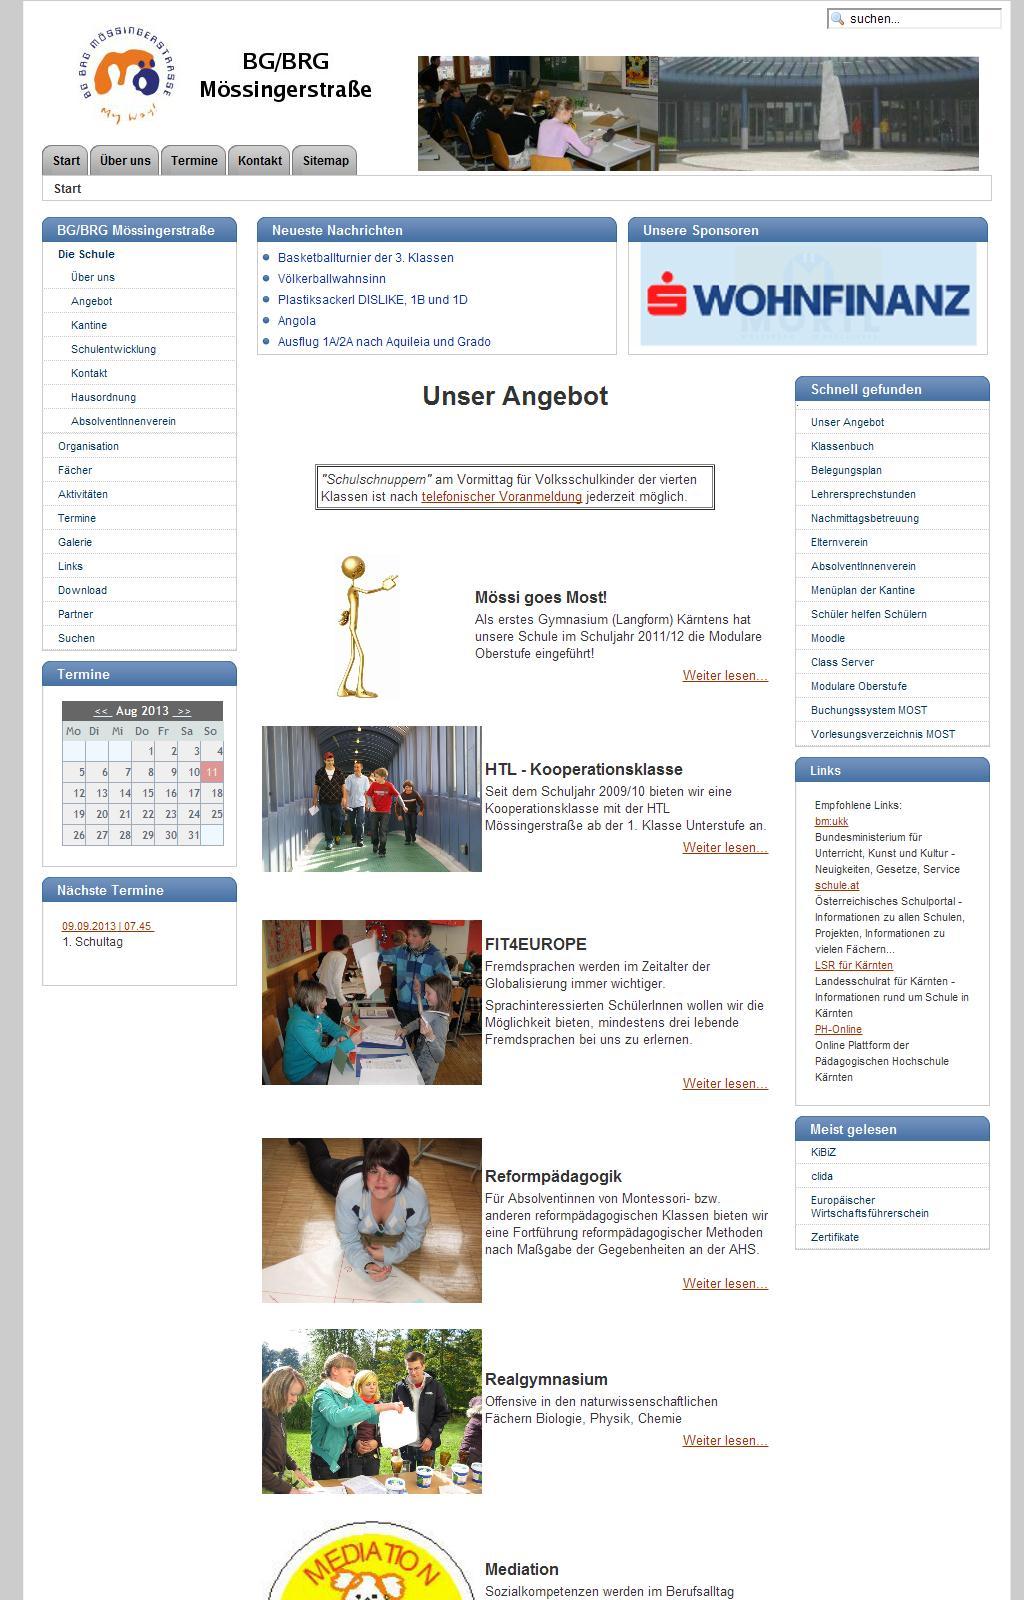 Willkommen am BG/BRG Mössingerstraße